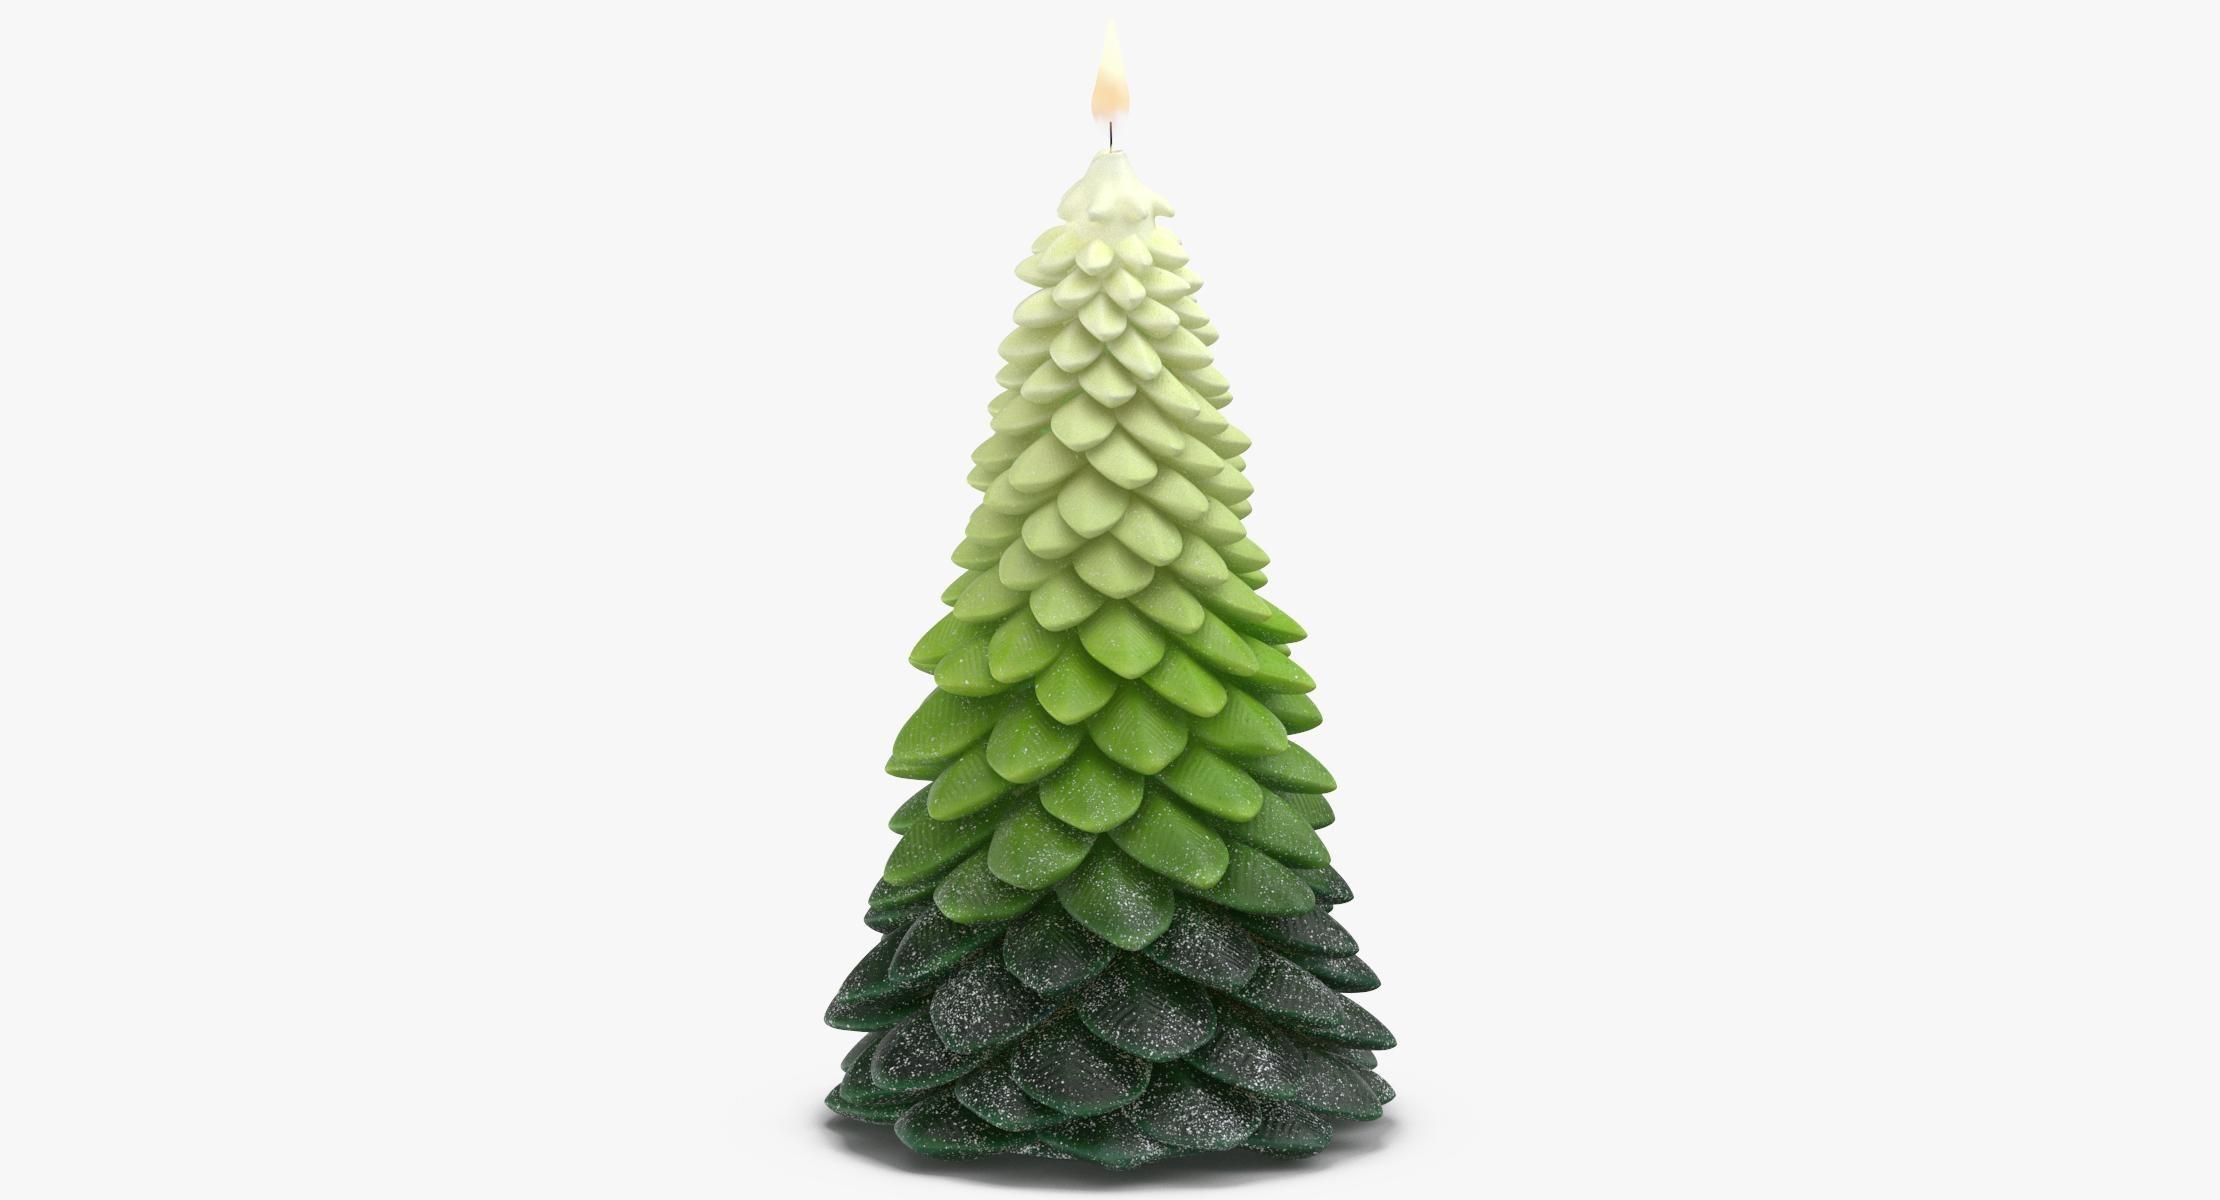 Tree Shaped Candle 02 Big Lit - reel 1